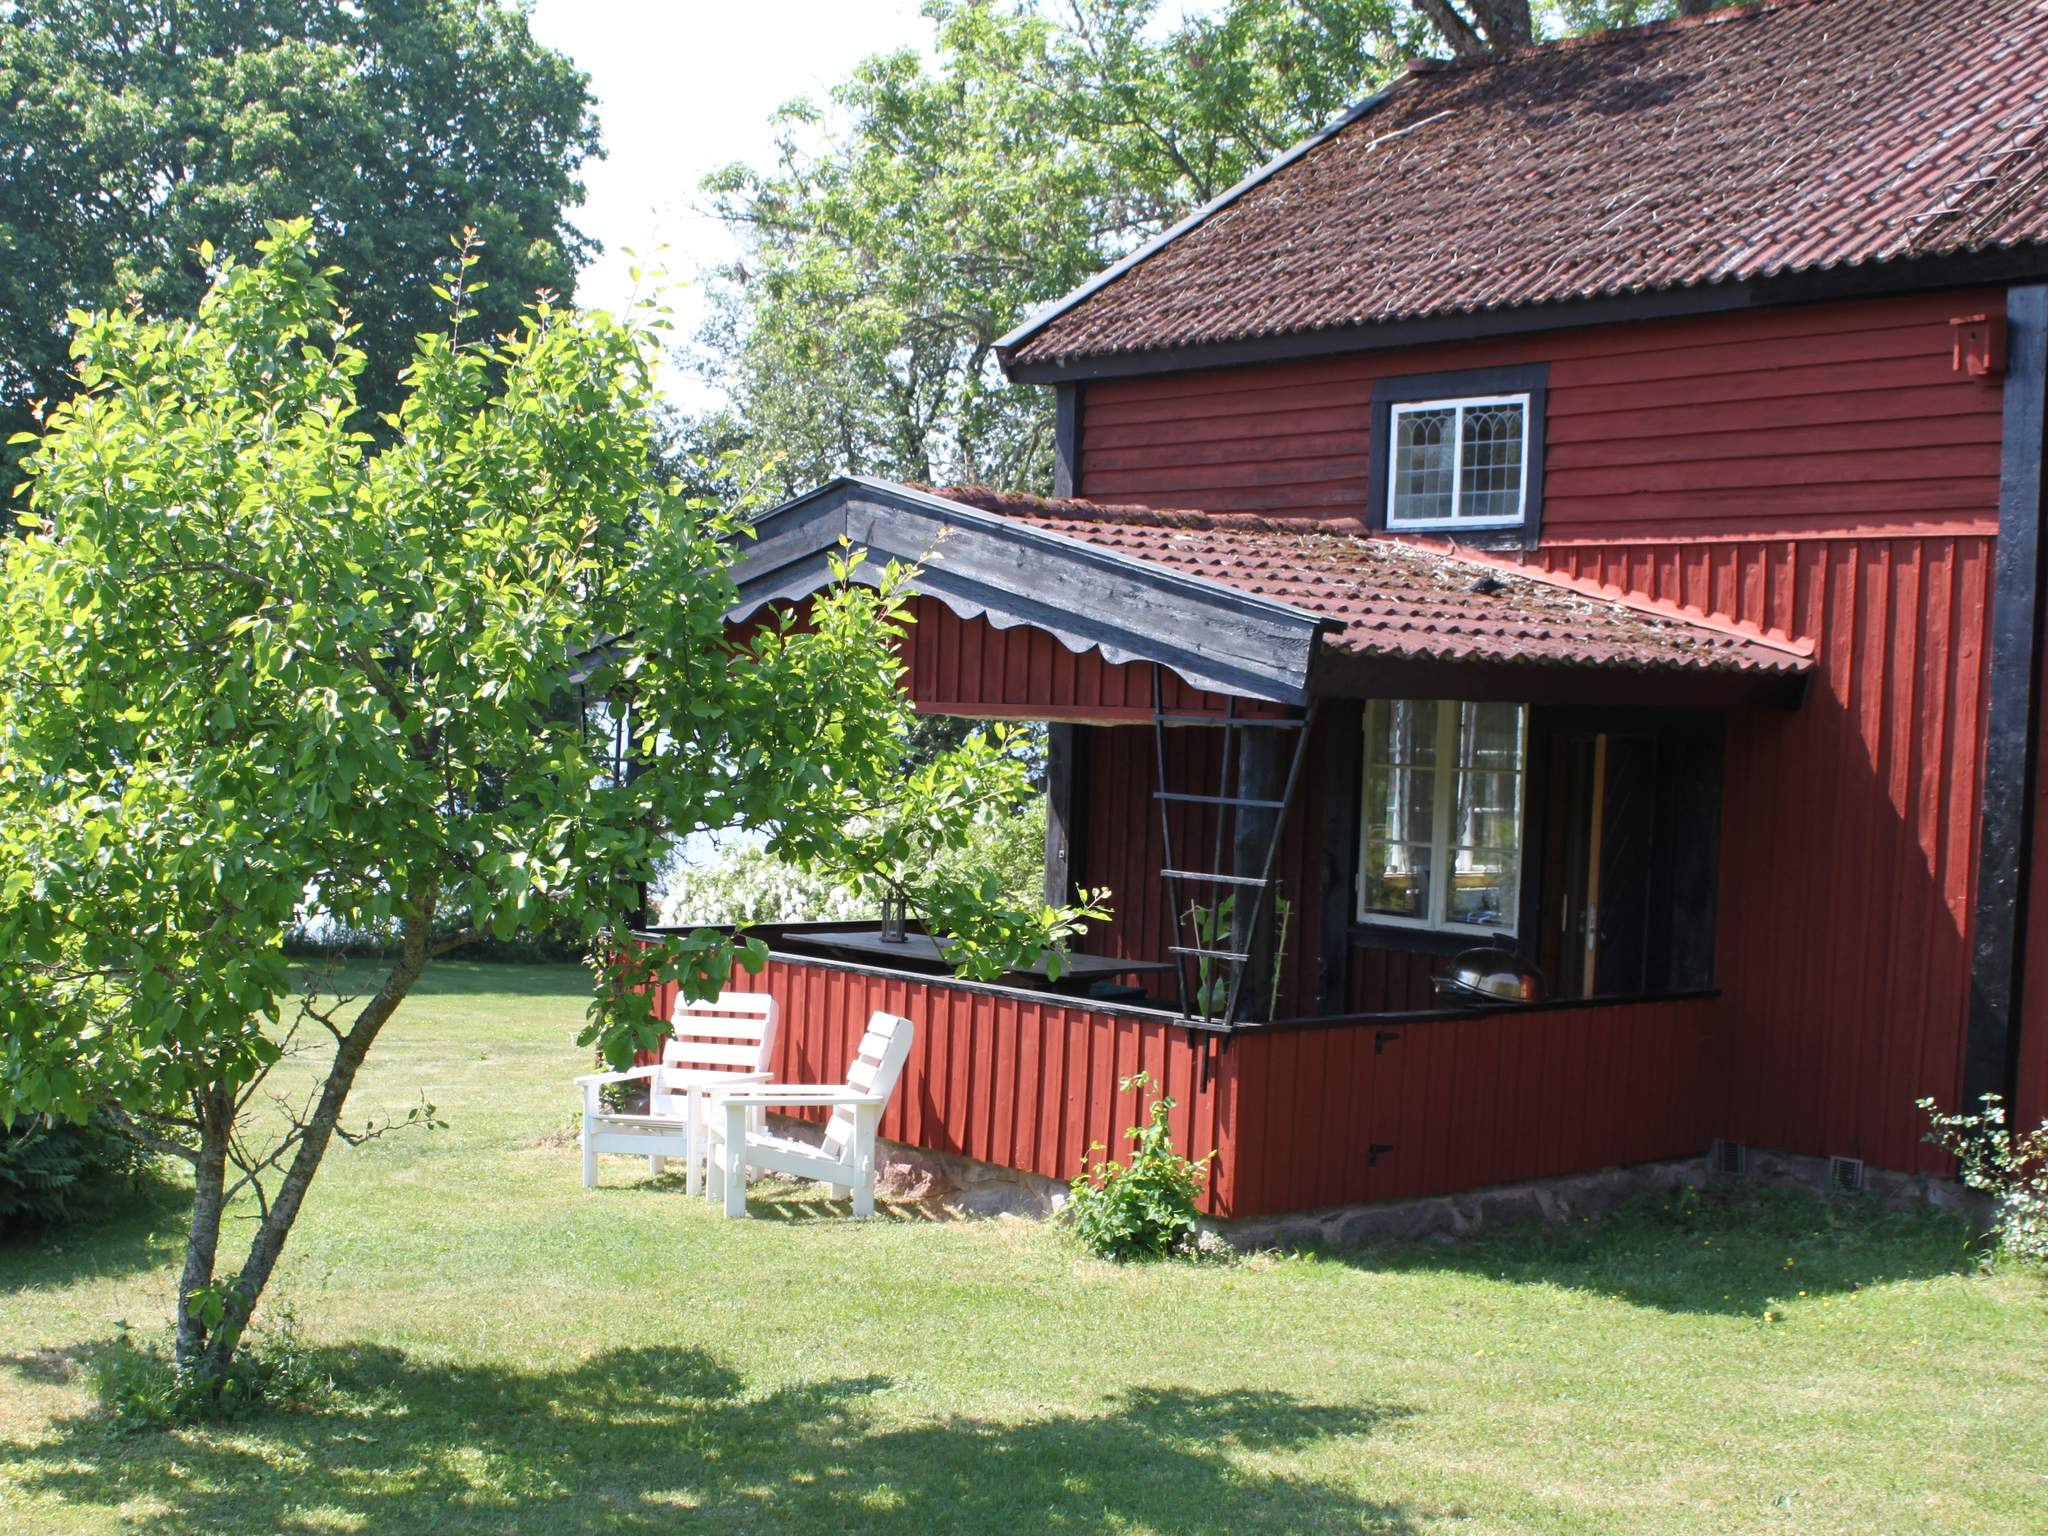 Ferienhaus Väddö (85466), Väddö, Region Stockholm, Mittelschweden, Schweden, Bild 15